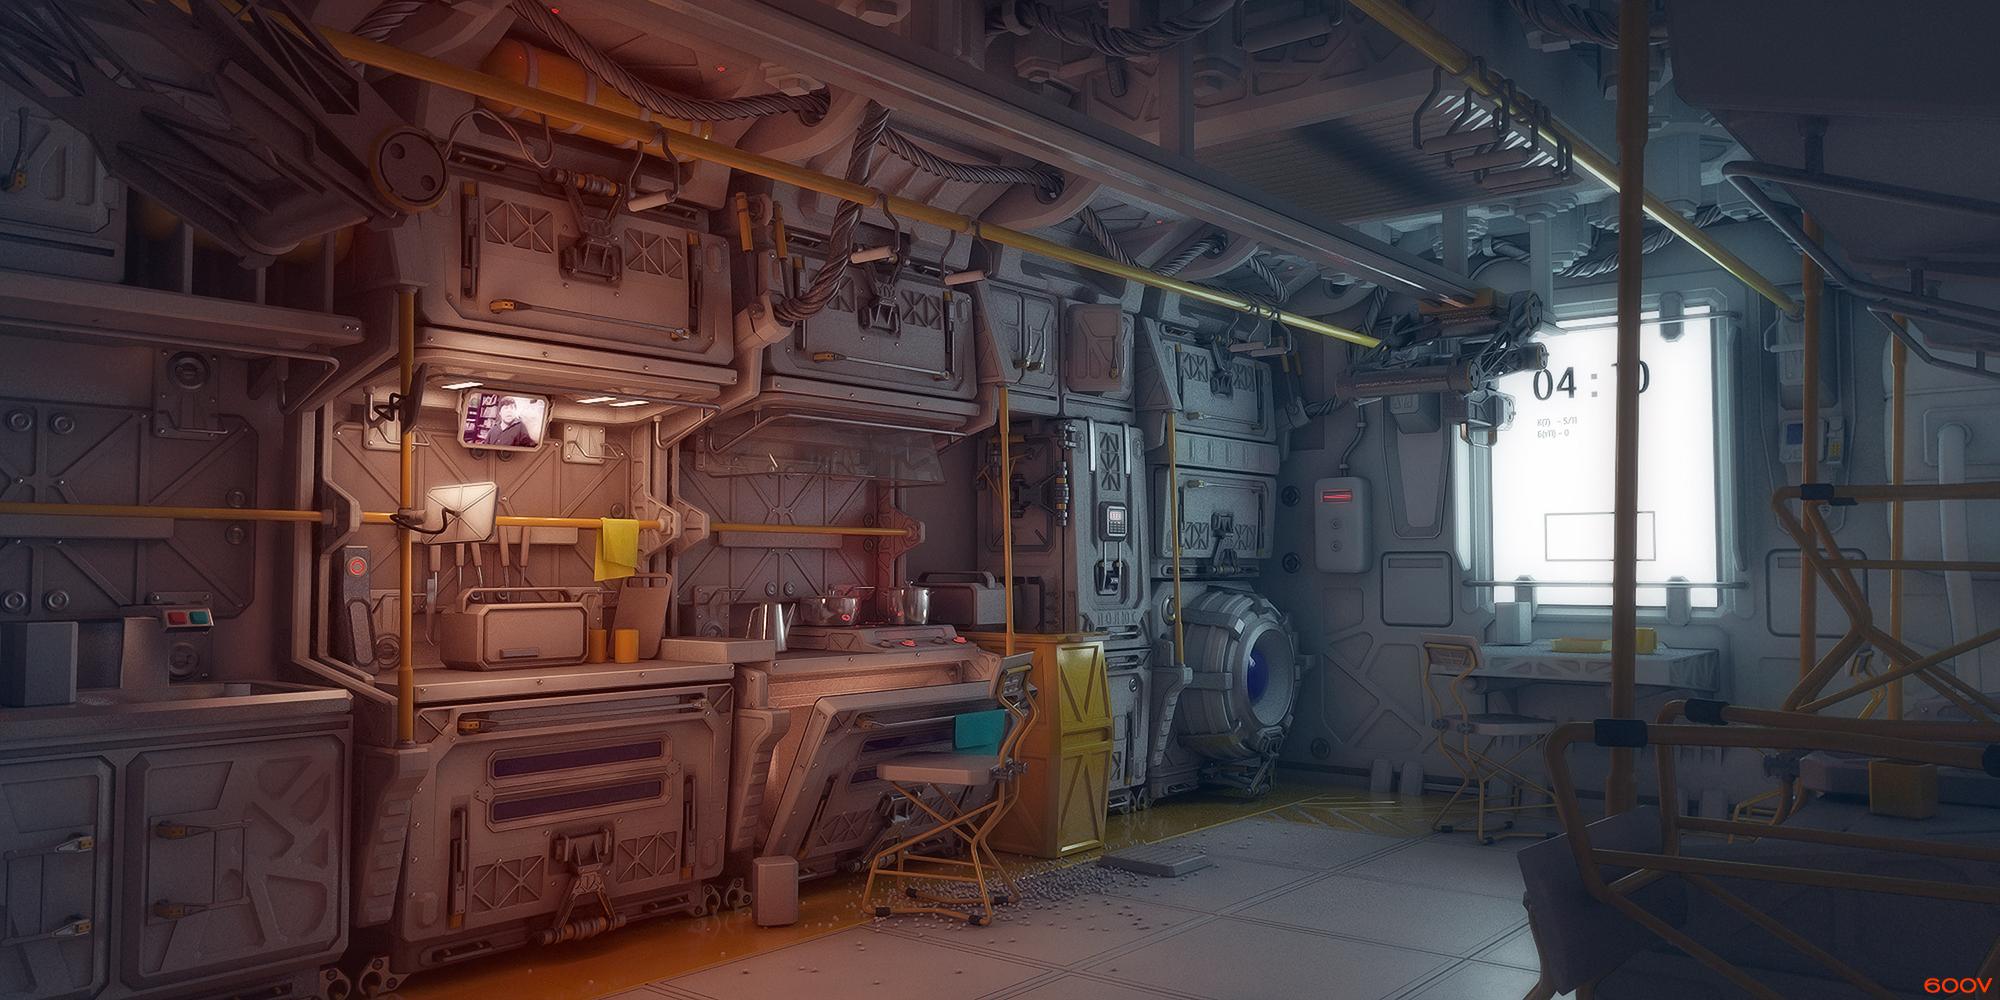 Kitchen zone by 600v on deviantart for Kitchen set environment